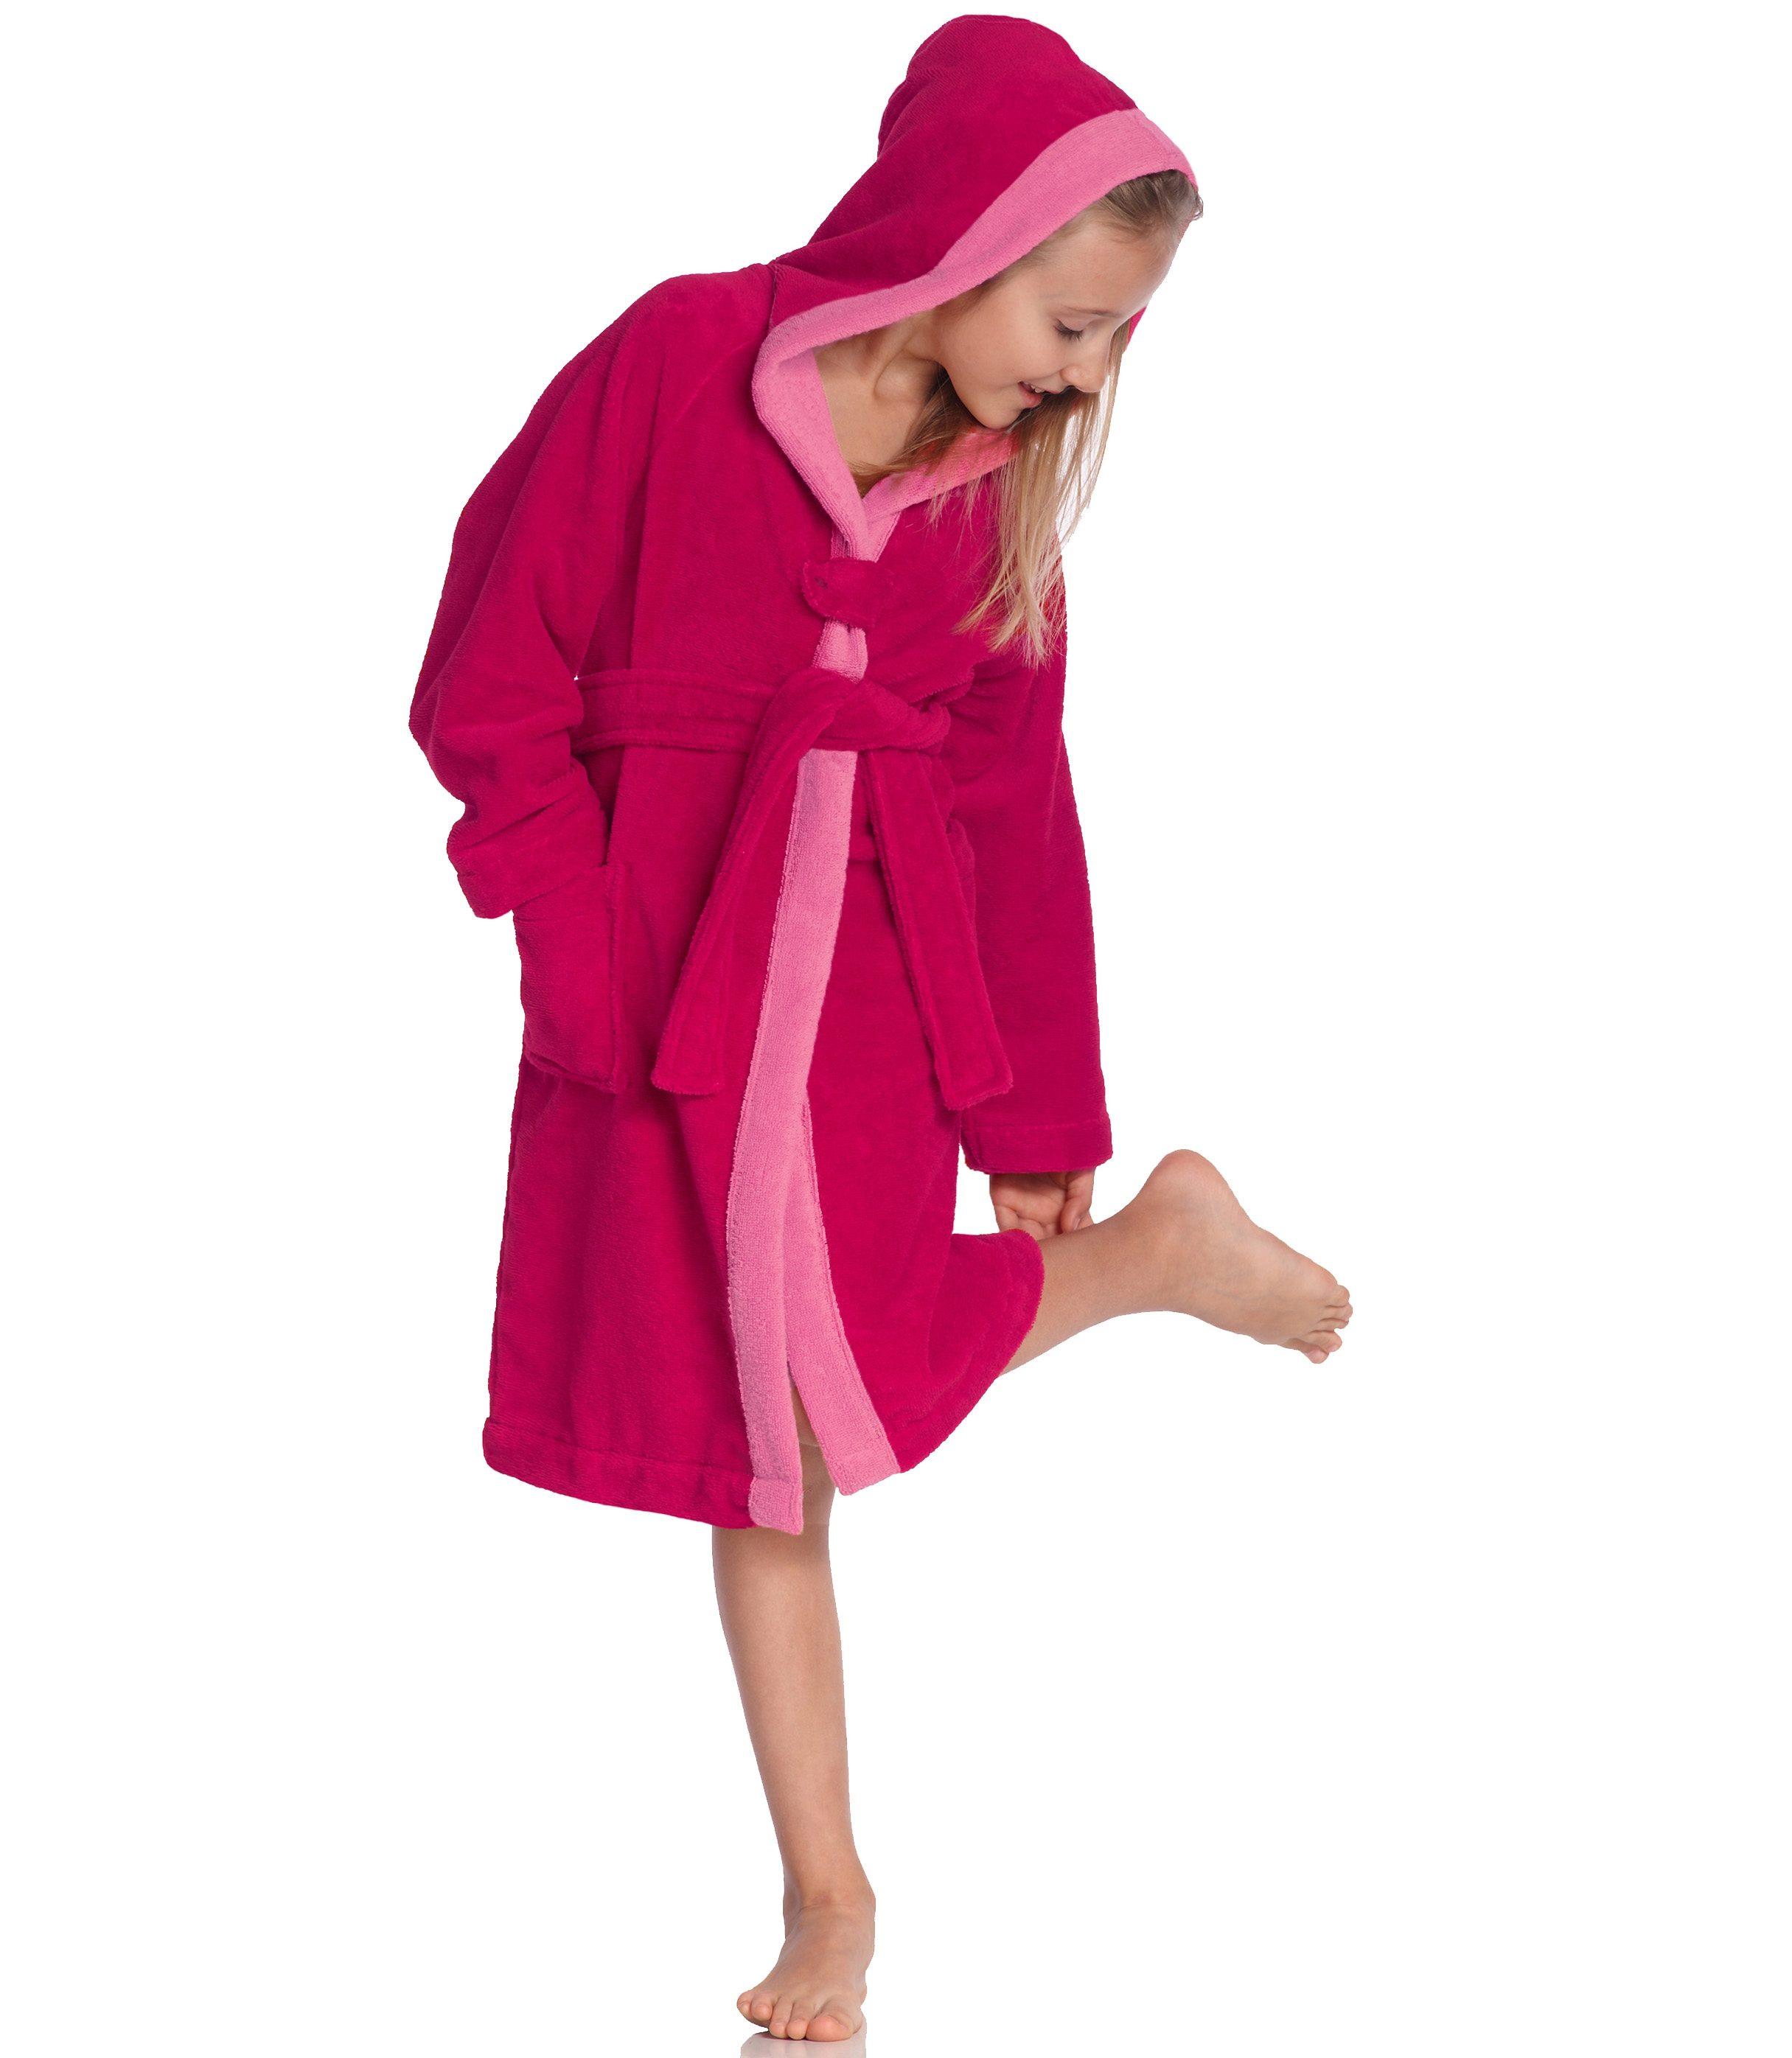 Kinderbademantel »Bixie«, Vossen | Bekleidung > Wäsche > Bademäntel | Rosa | Velours | VOSSEN